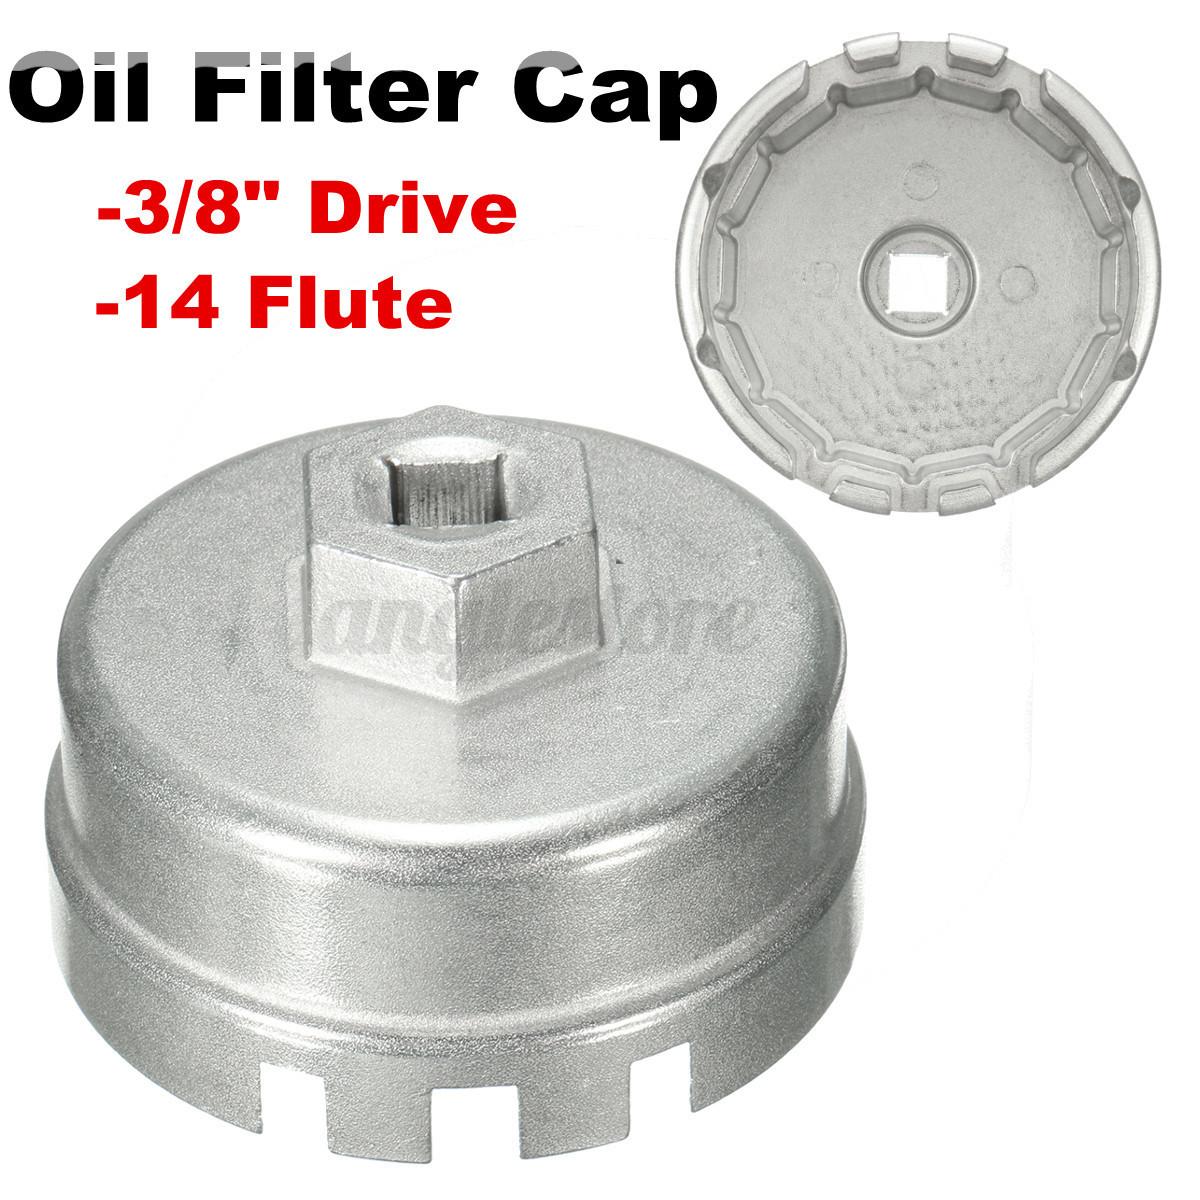 aluminum oil filter cap wrench for toyota prius corolla. Black Bedroom Furniture Sets. Home Design Ideas